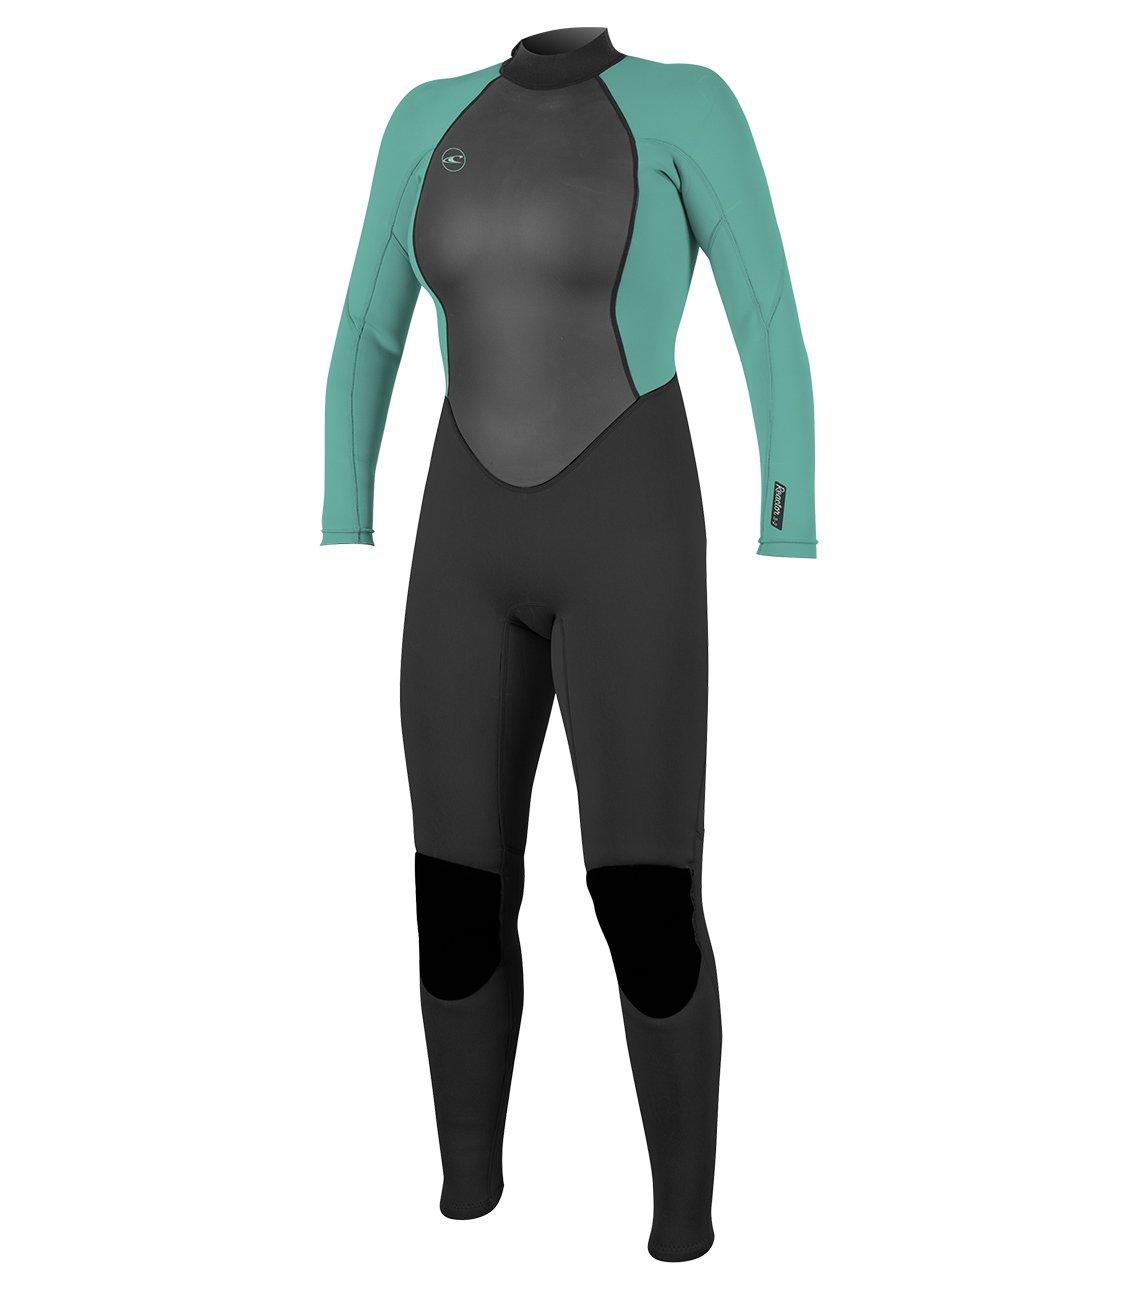 O'Neill Women's Reactor-2 3/2mm Back Zip Full Wetsuit, Black/Aqua, 4